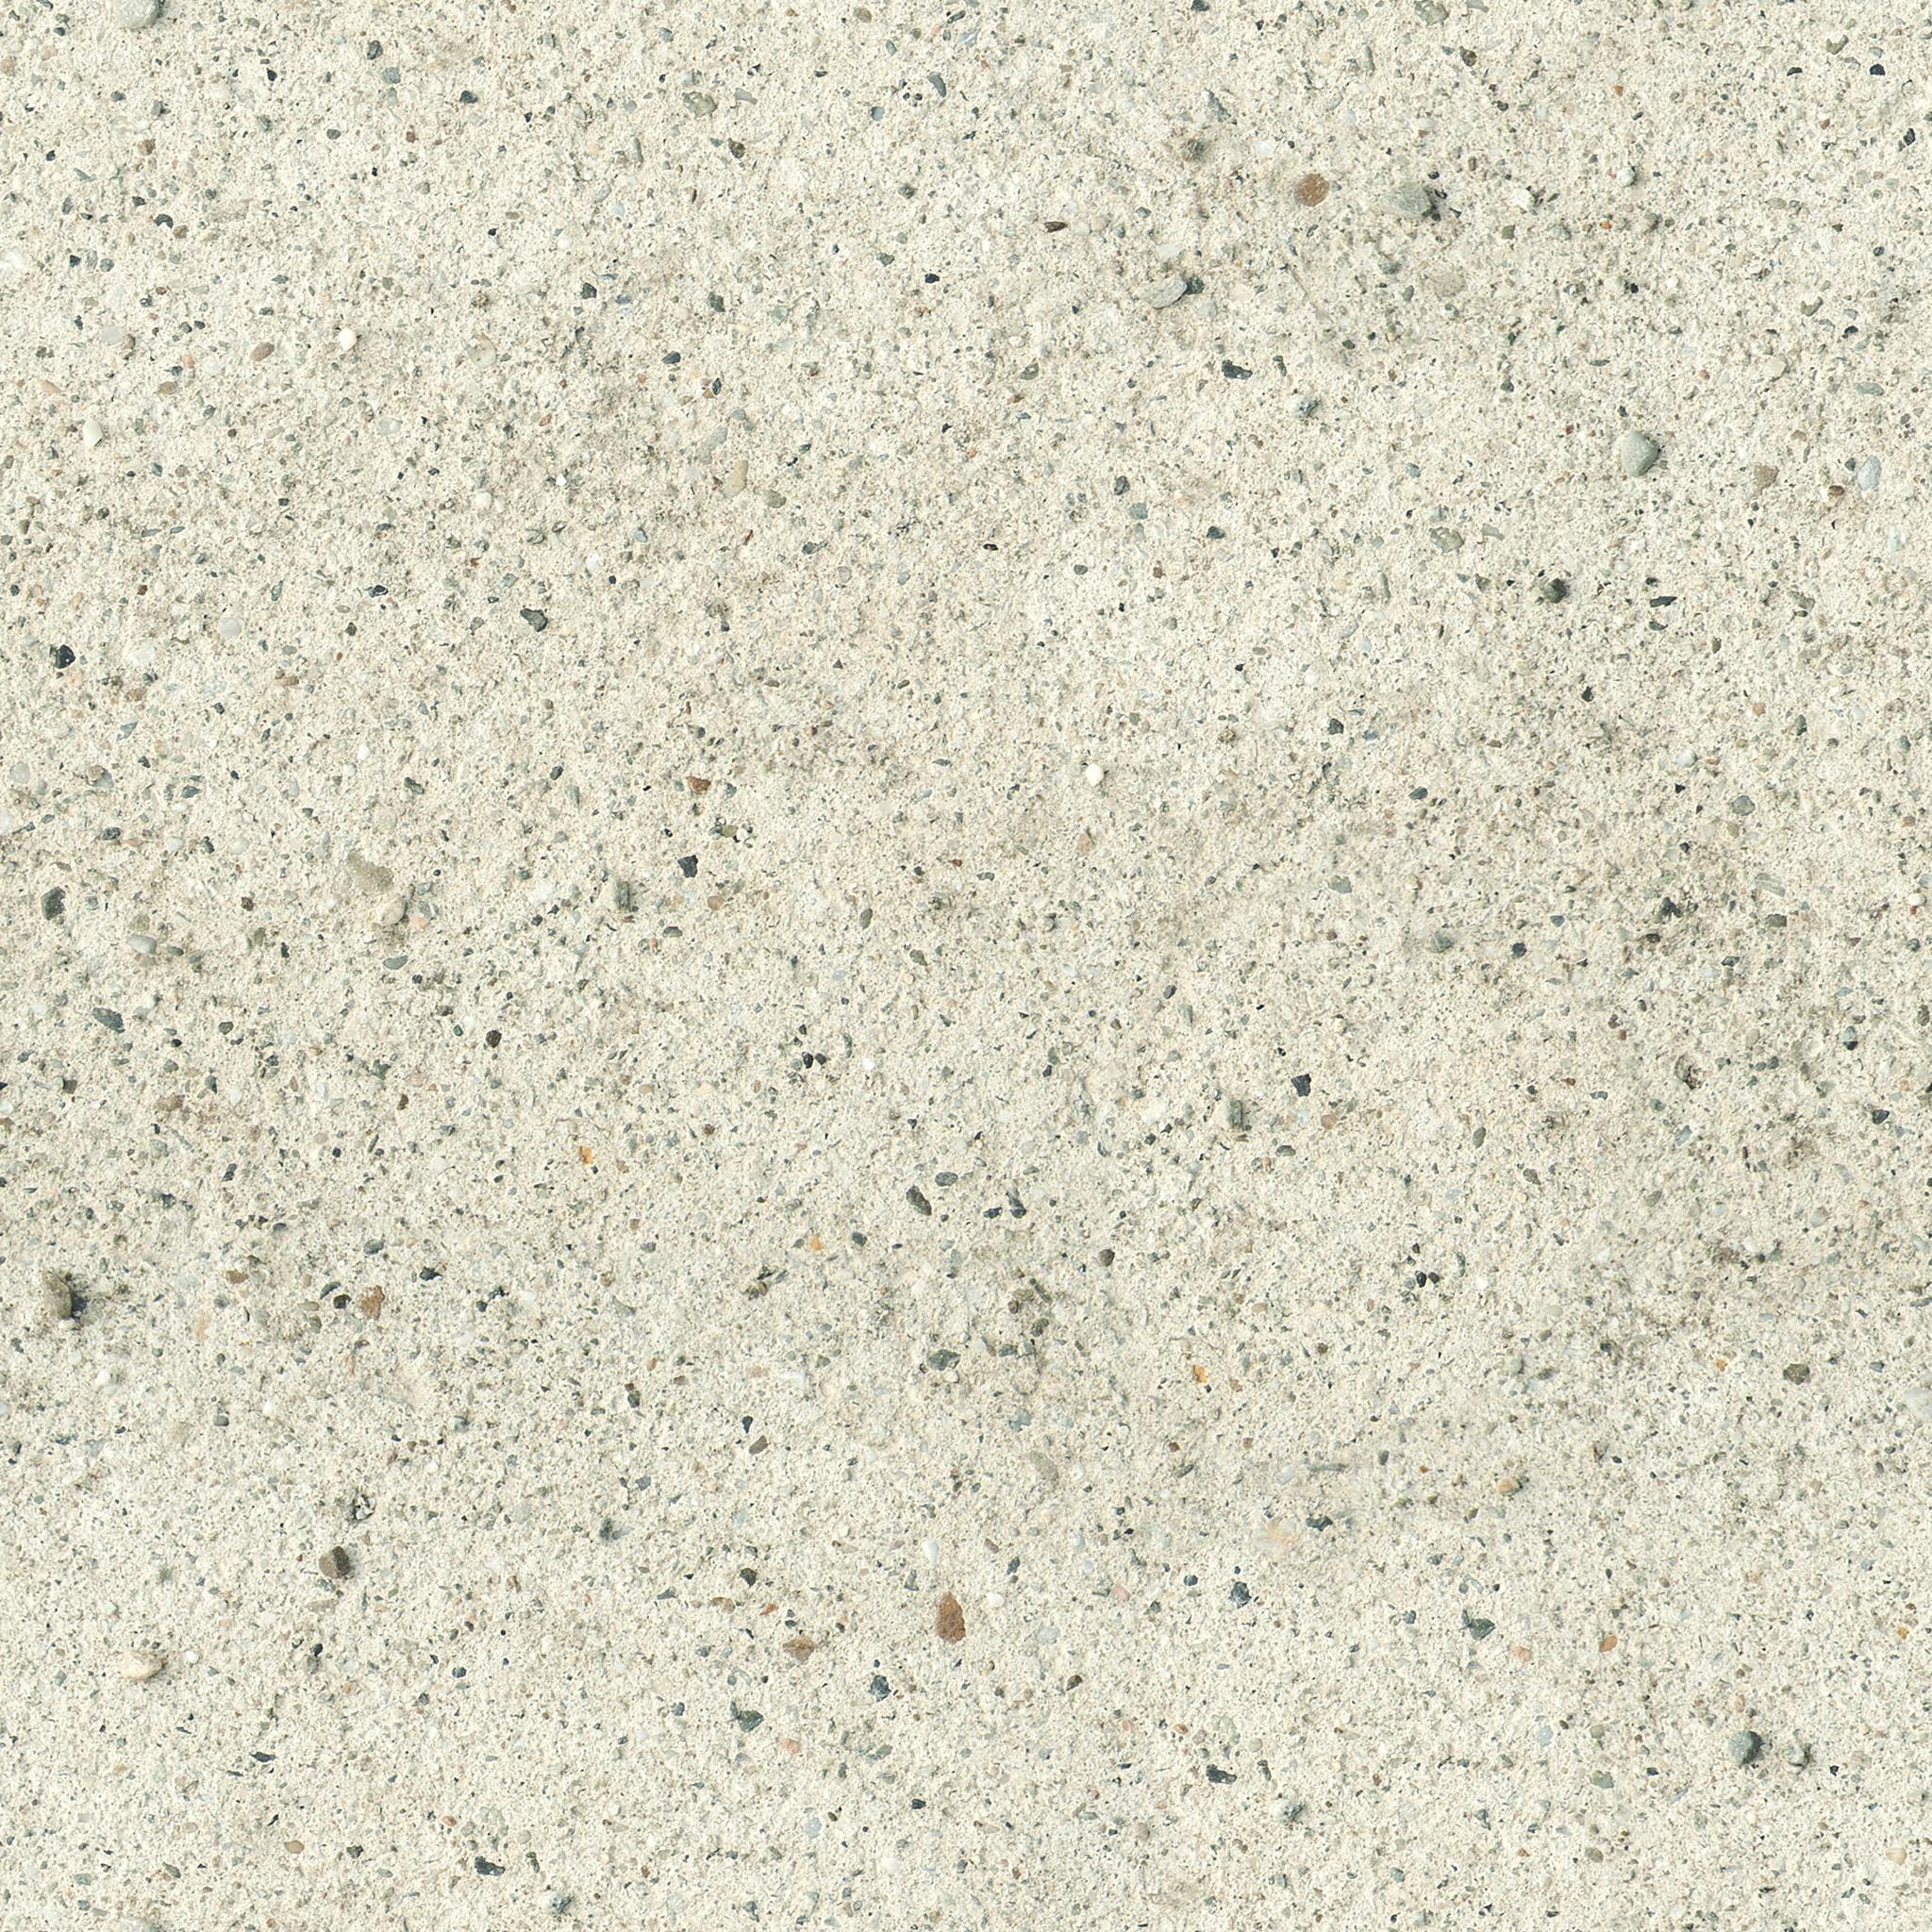 Flecked Light Concrete.jpg